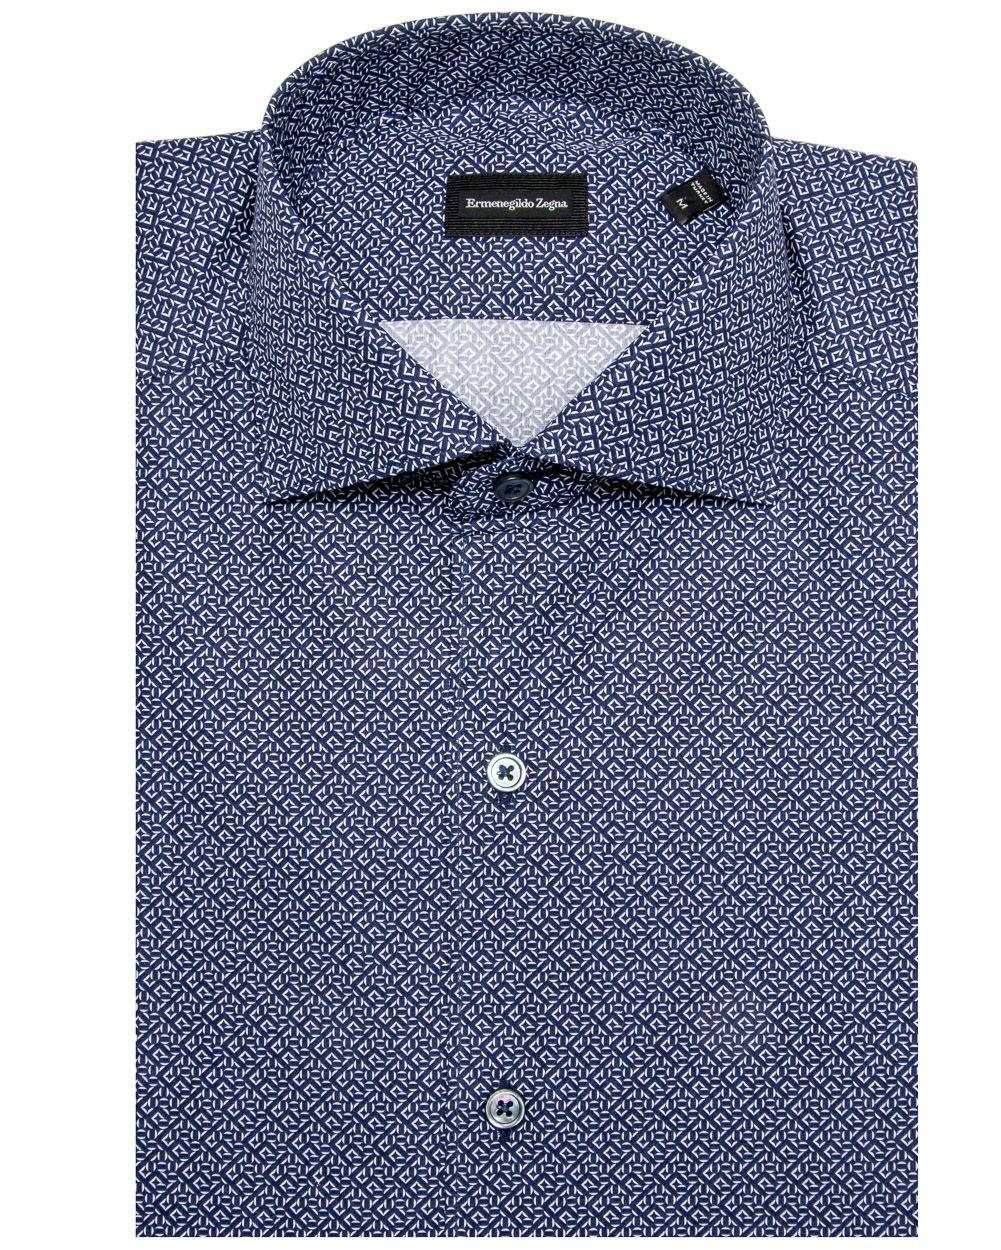 Ermenegildo Zegna Navy Geometric Dress Shirt Classic Fit Spread